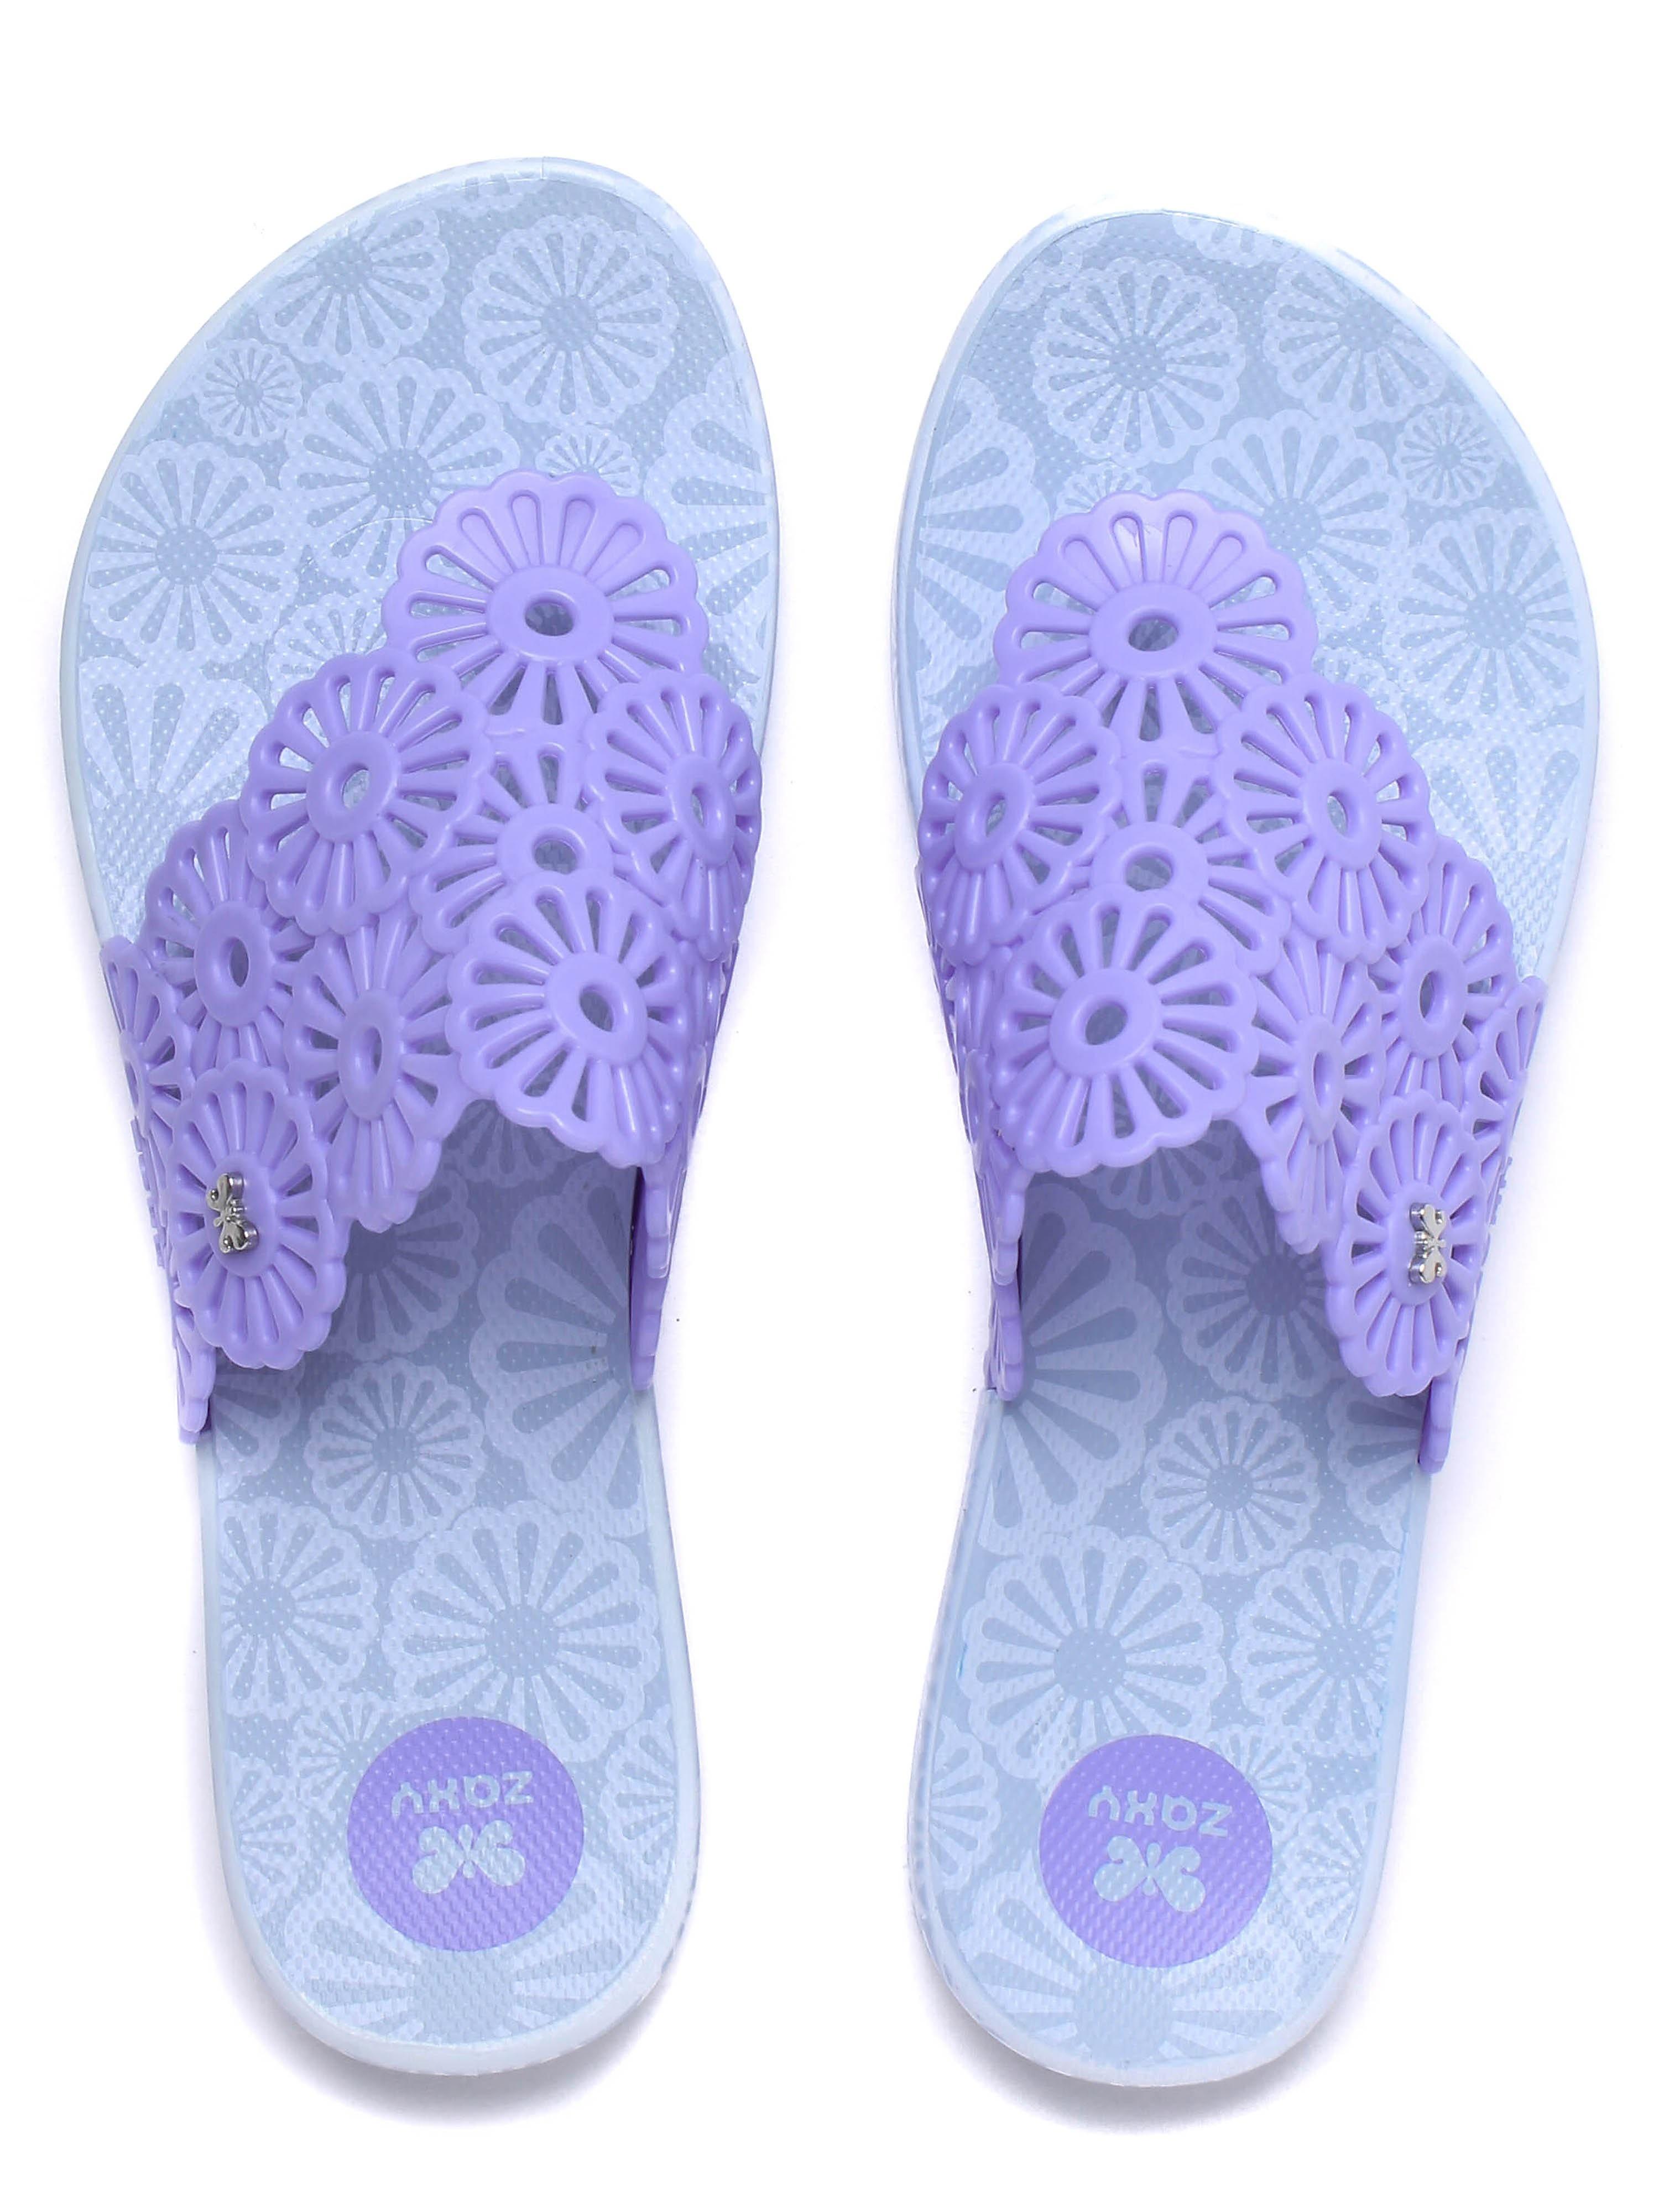 Zaxy Women's Intense Holiday Flip Flop - Lilac